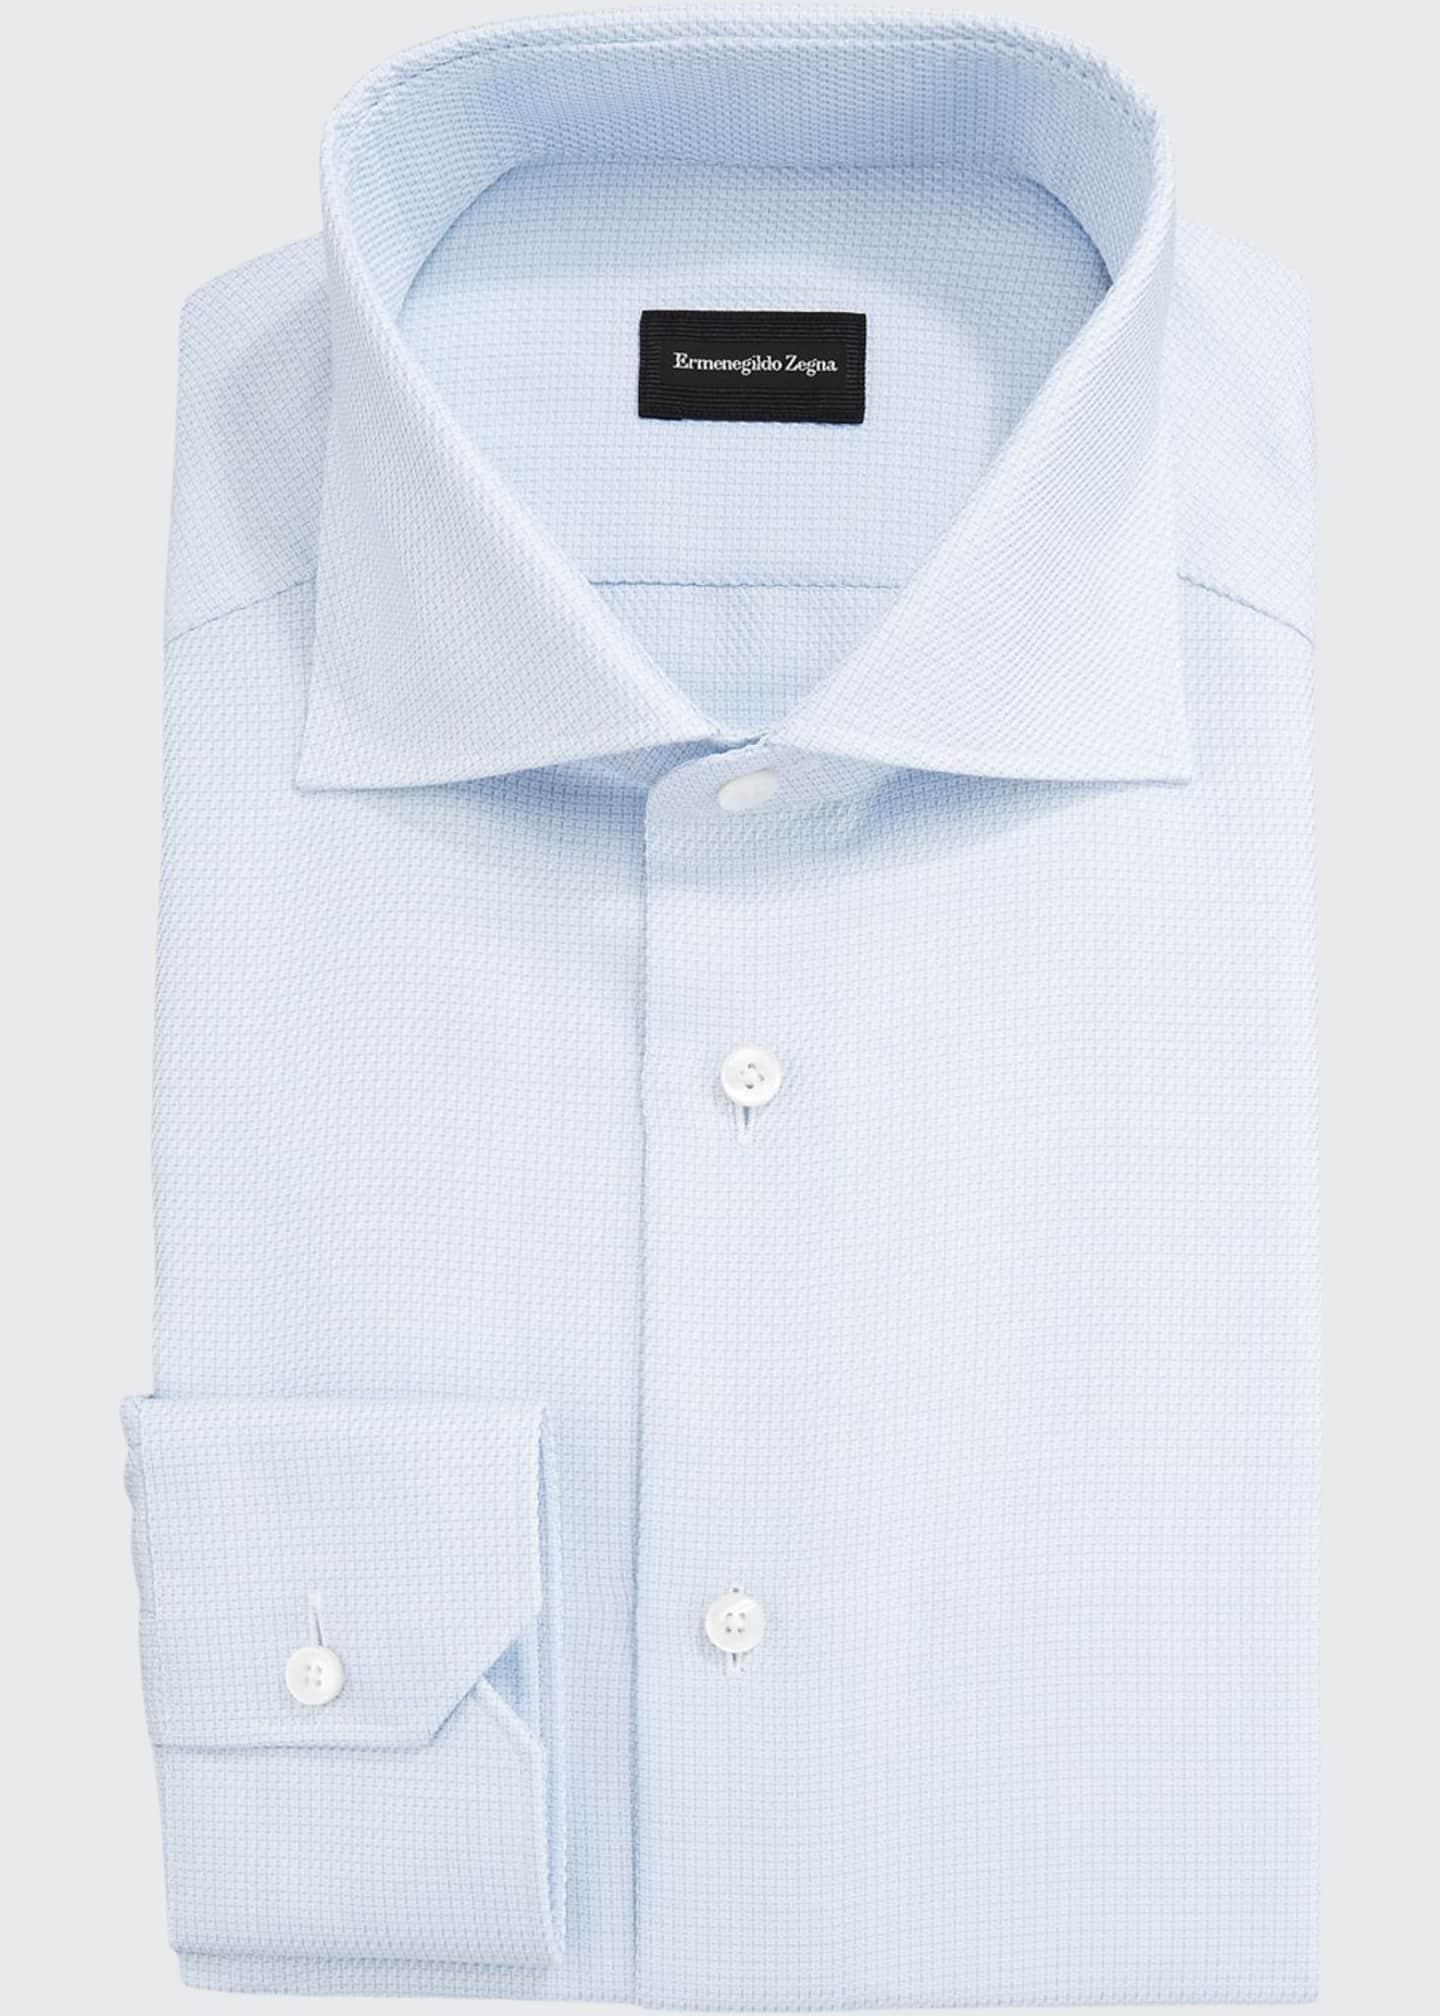 Ermenegildo Zegna Men's Stair Weave Dress Shirt